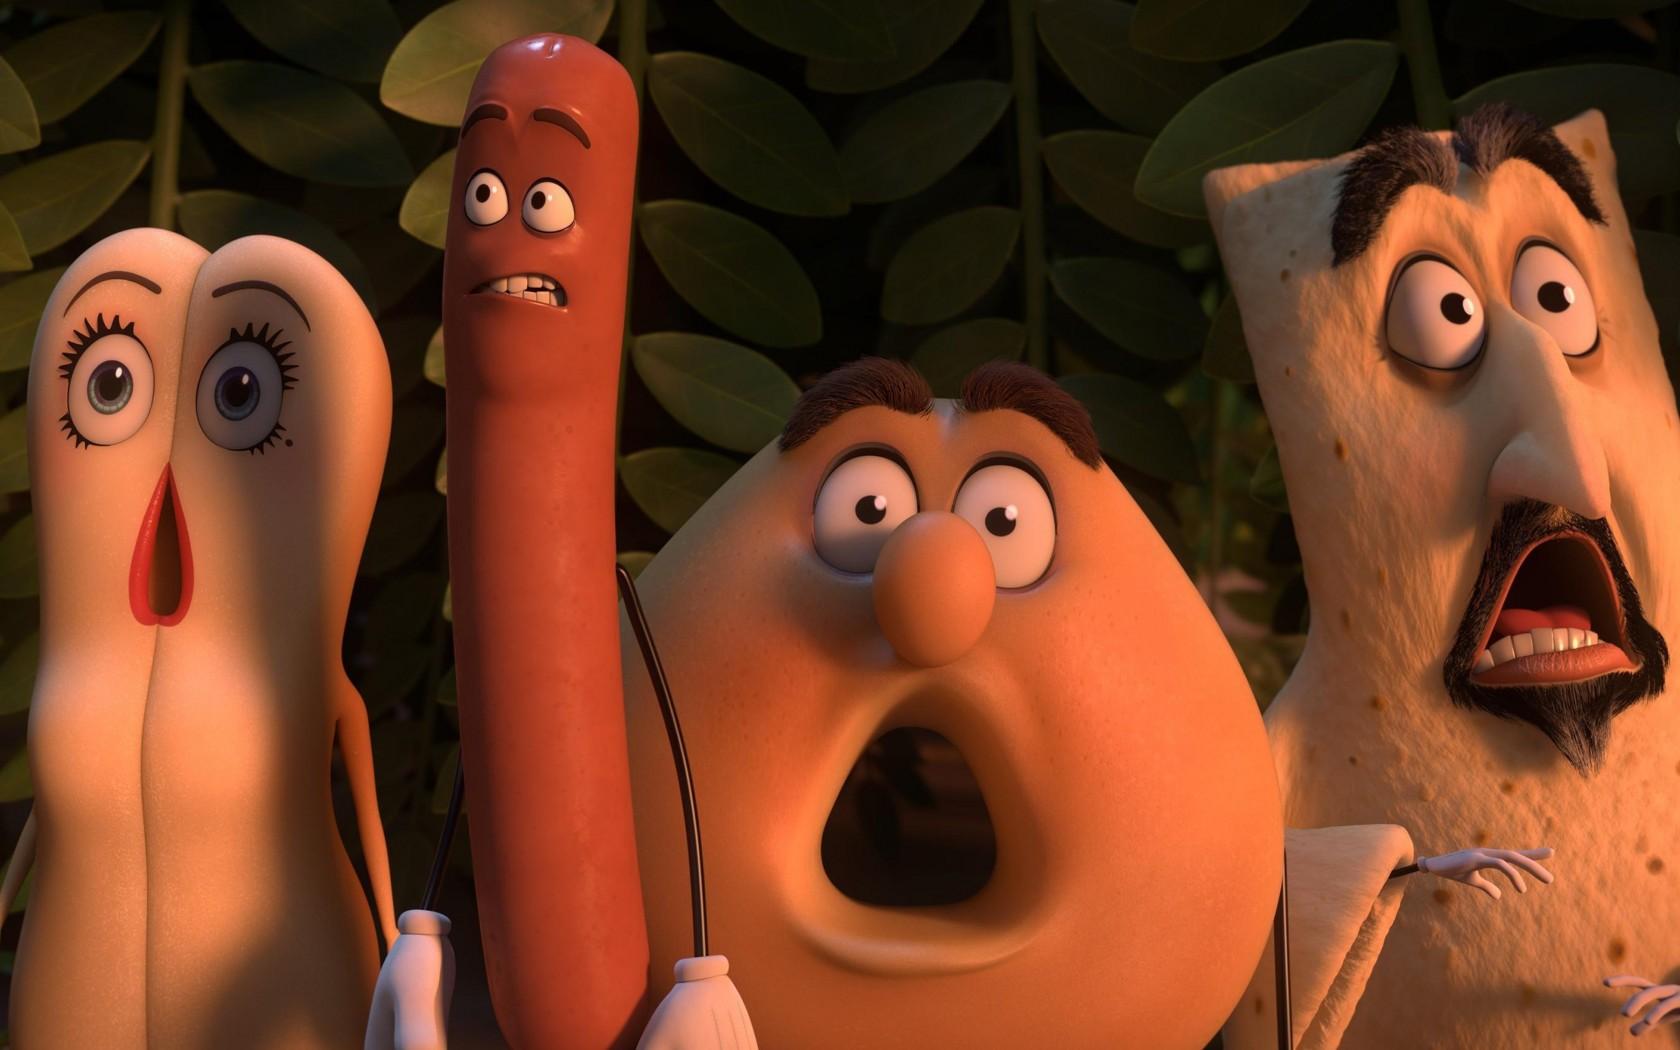 Wallpaper : roti, merah, gambar kartun, emosi, screenshot, partai